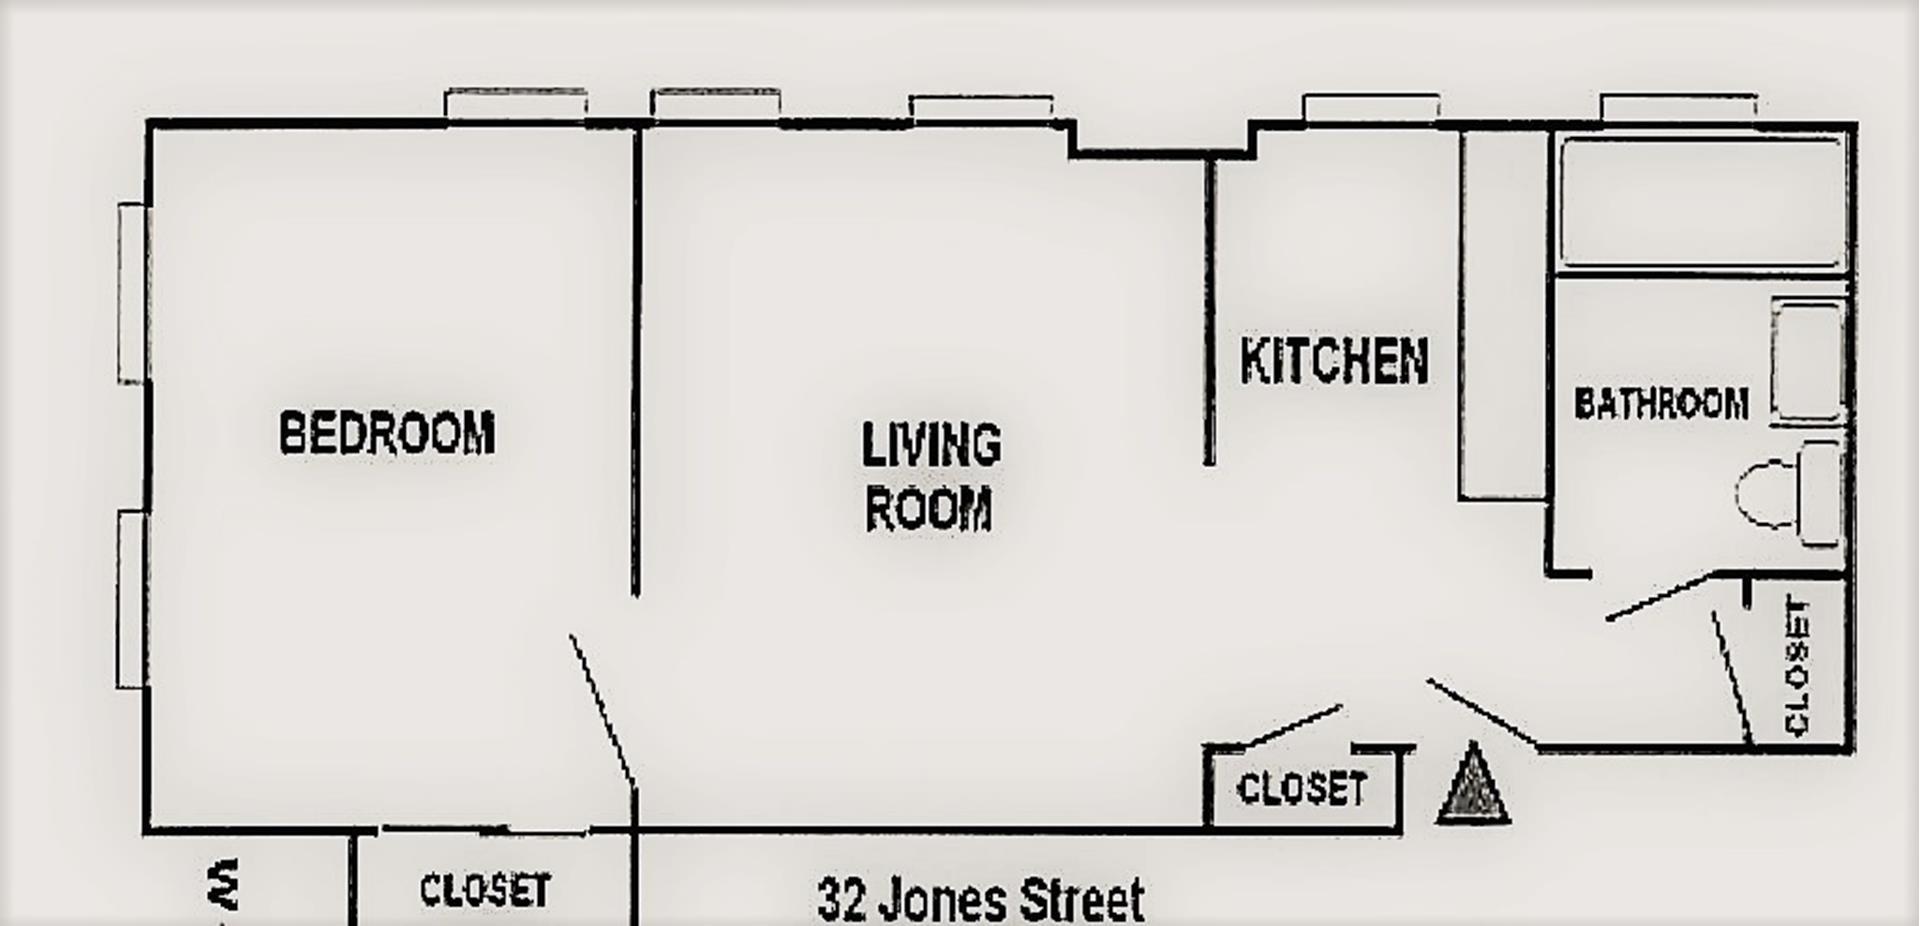 Floor plan of 32 Jones St, 4B - Greenwich Village, New York